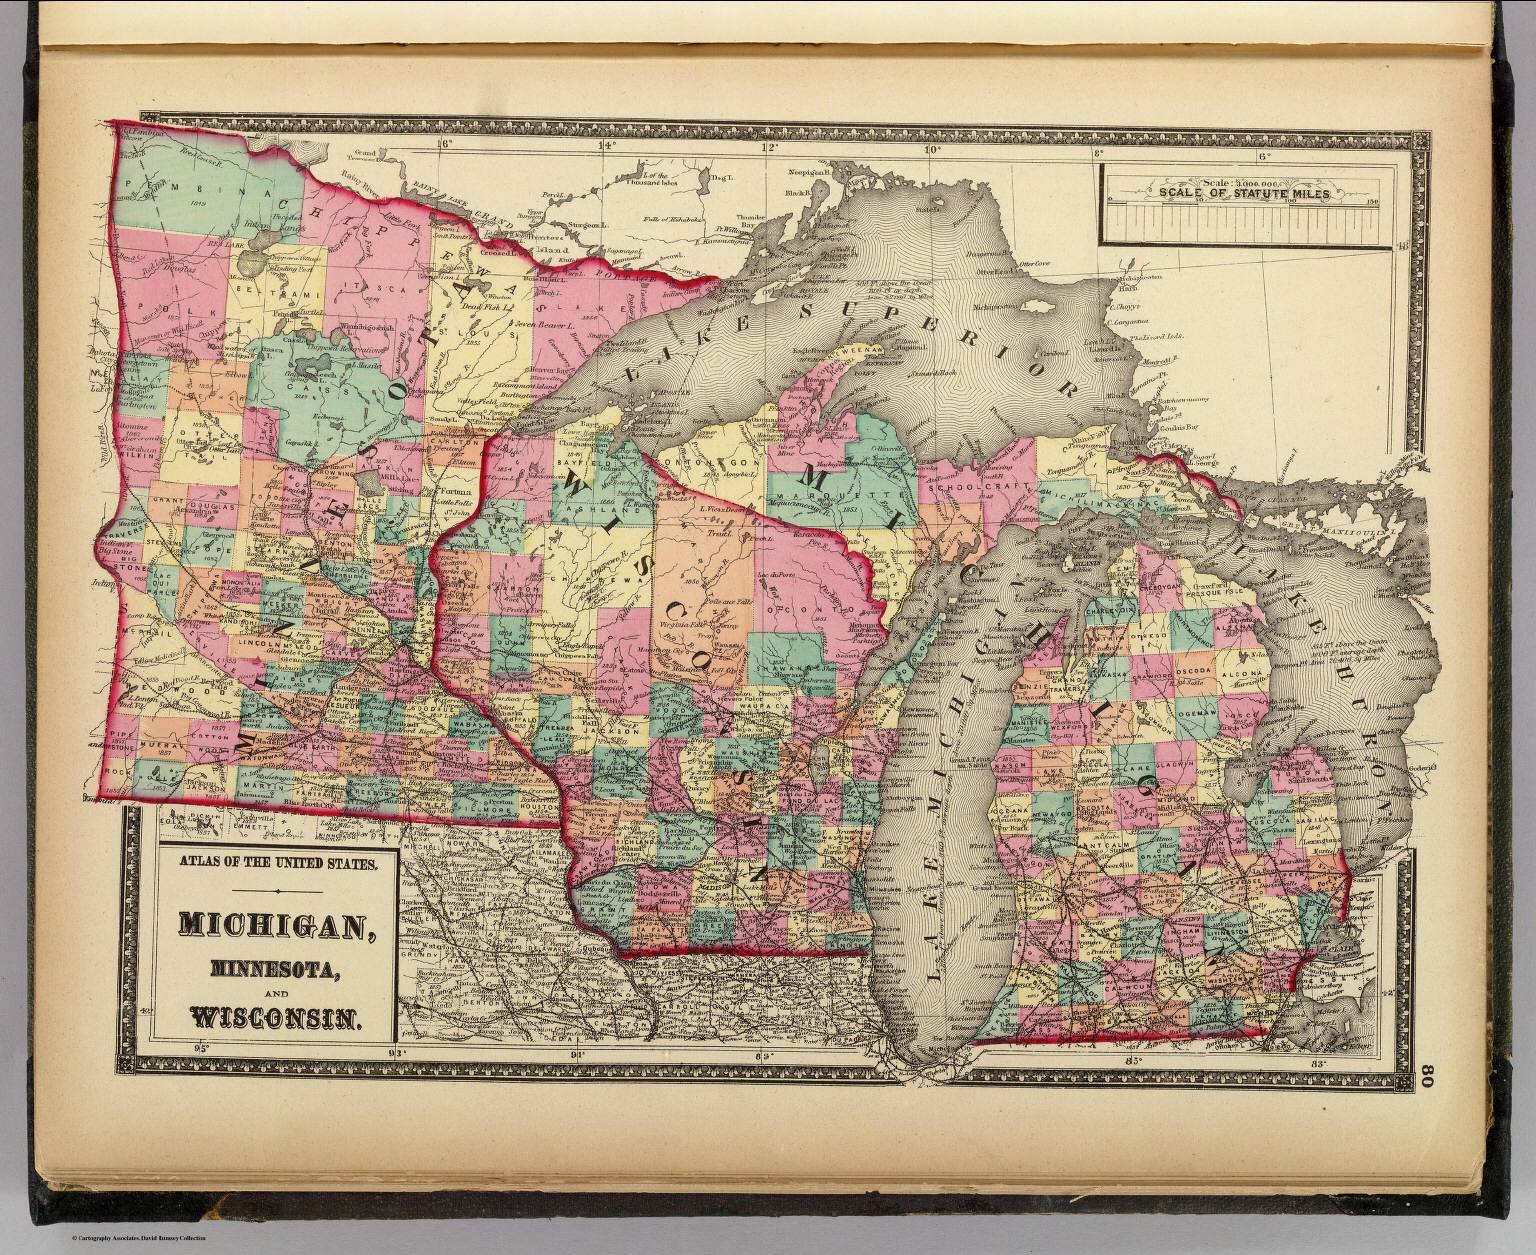 Michigan, Minnesota, and Wisconsin.